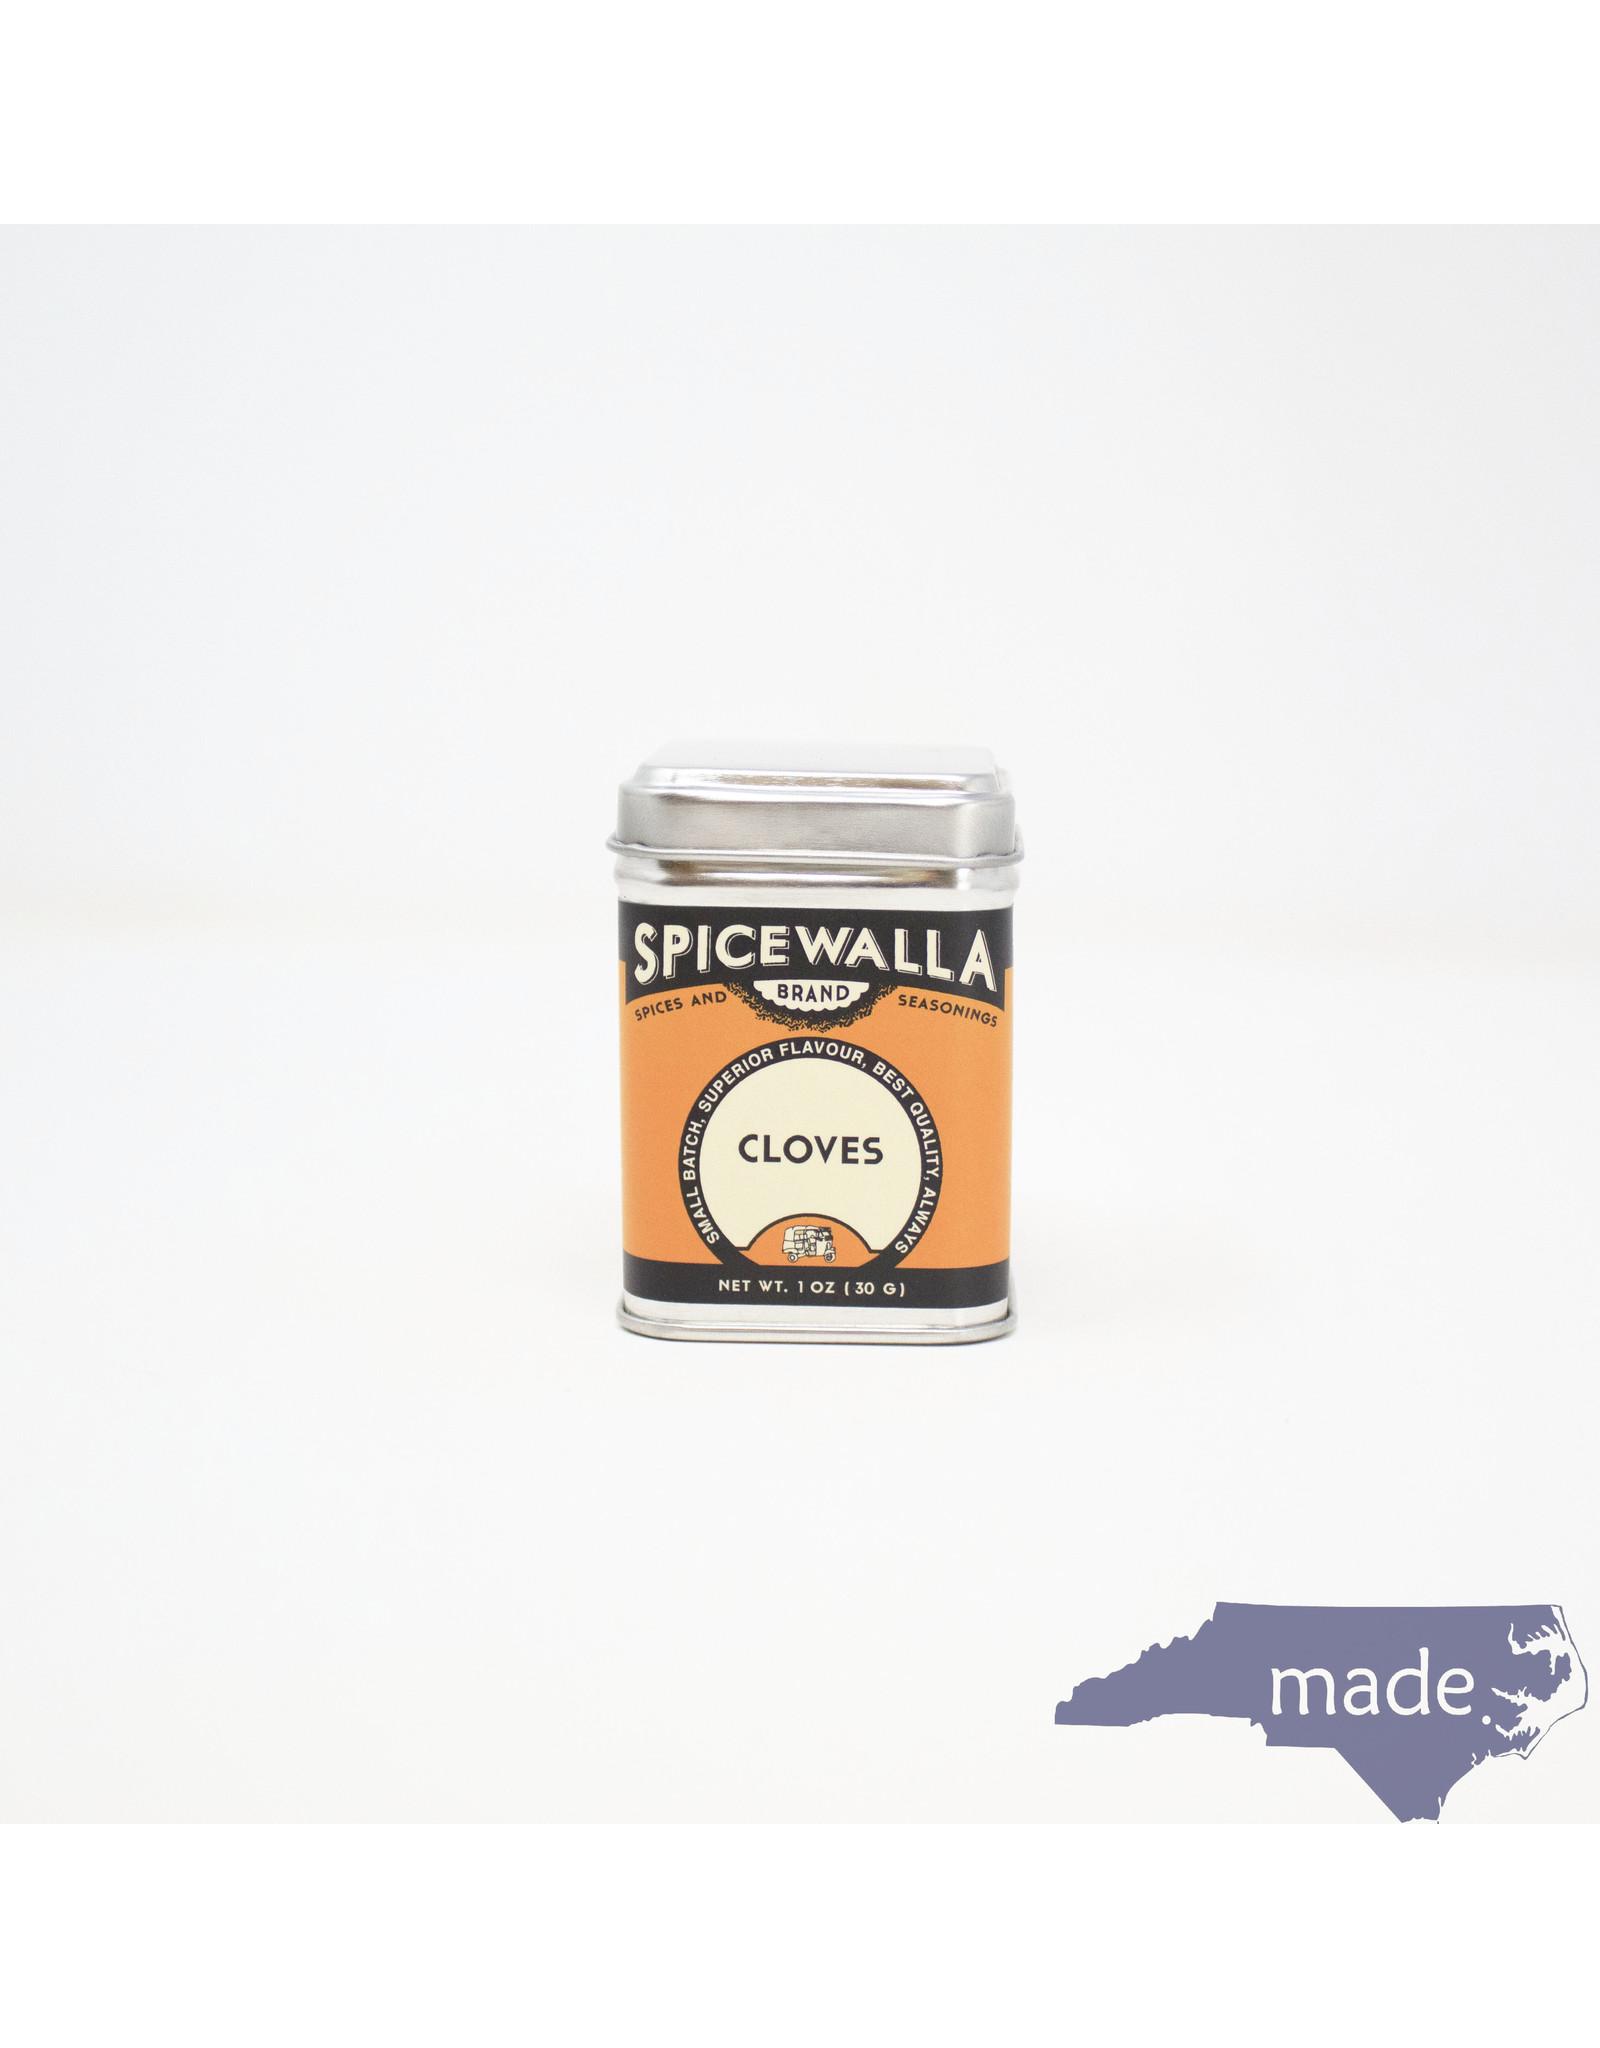 Spicewalla Cloves - Spicewalla